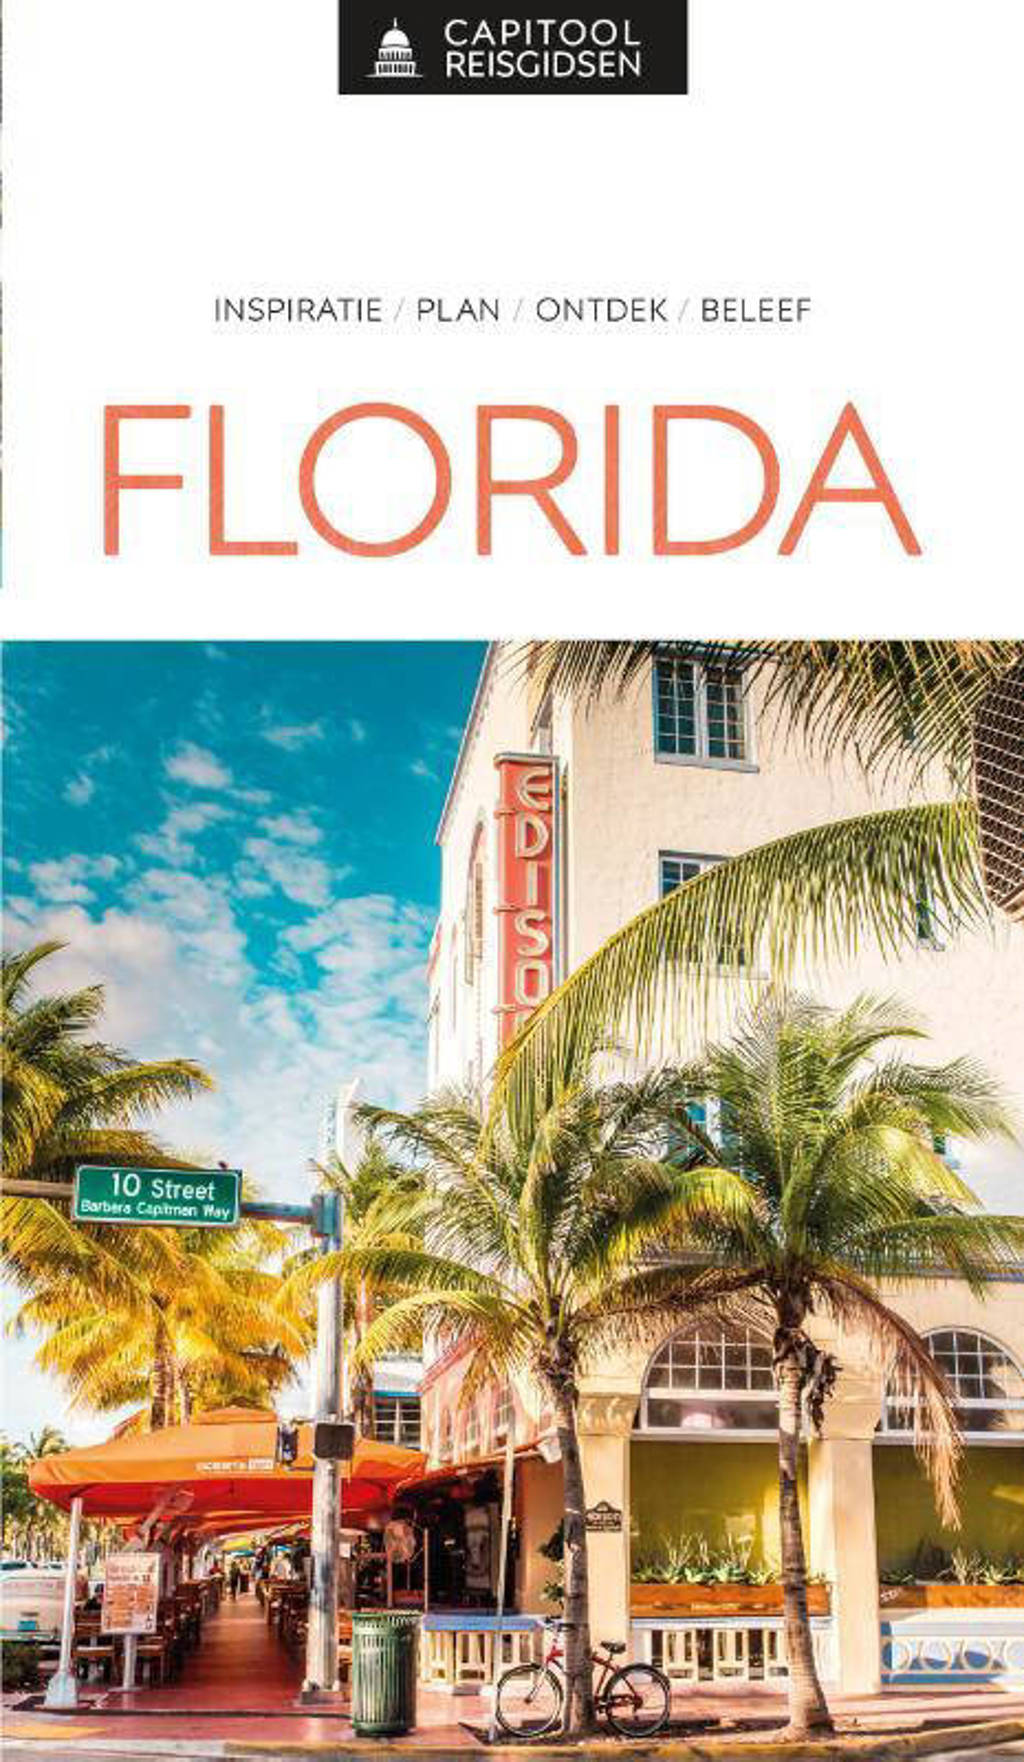 Capitool reisgidsen: Florida - Capitool